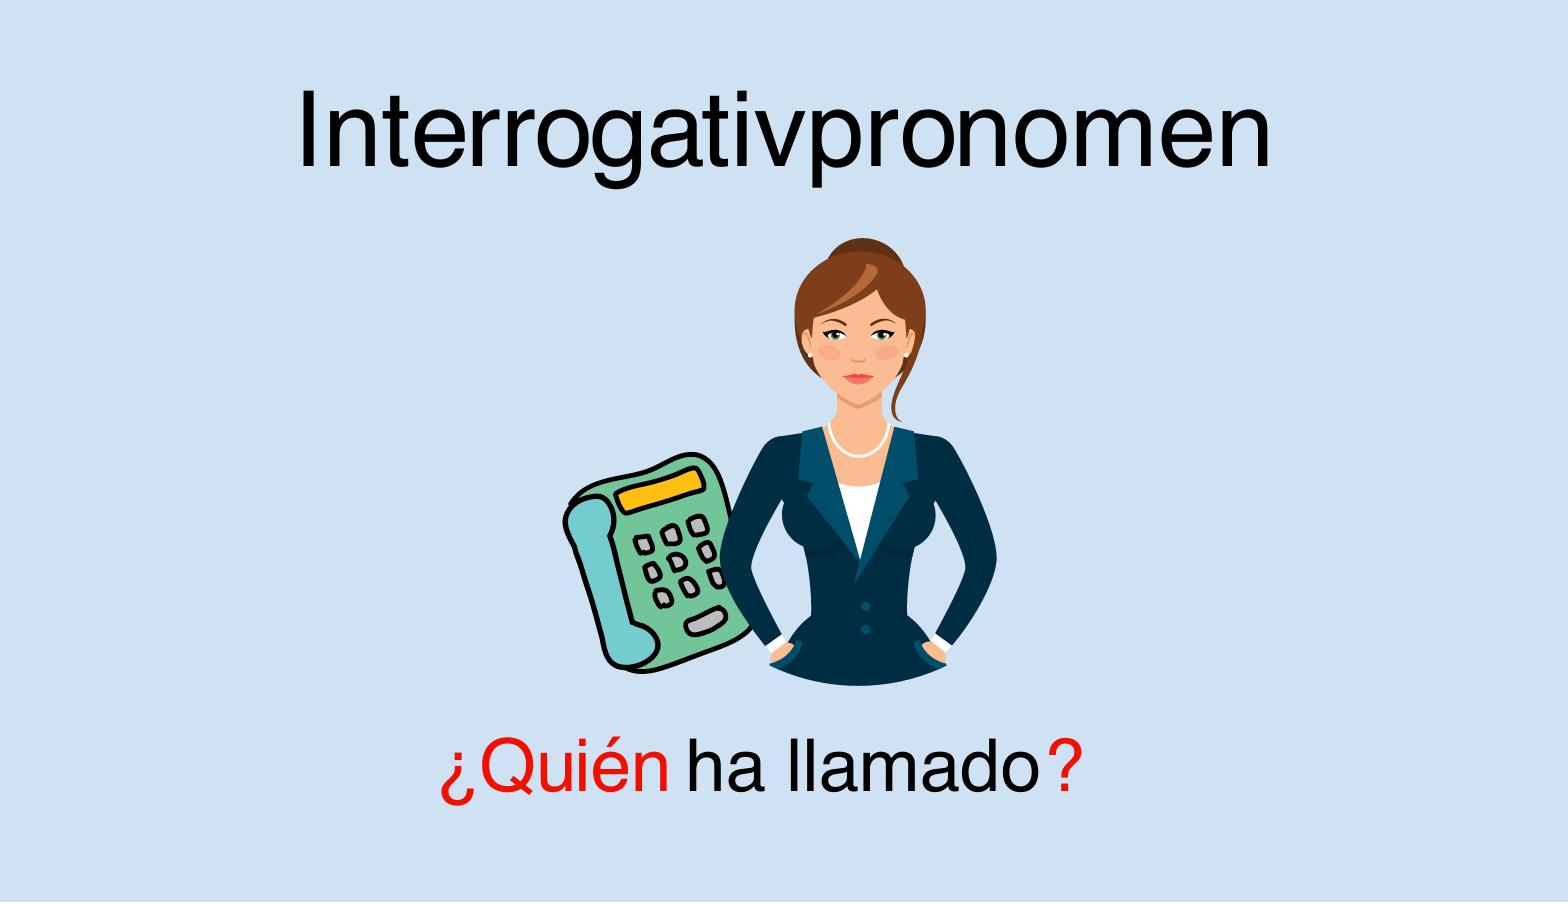 Spanische Interrogativpronomen (que, qual, ...)